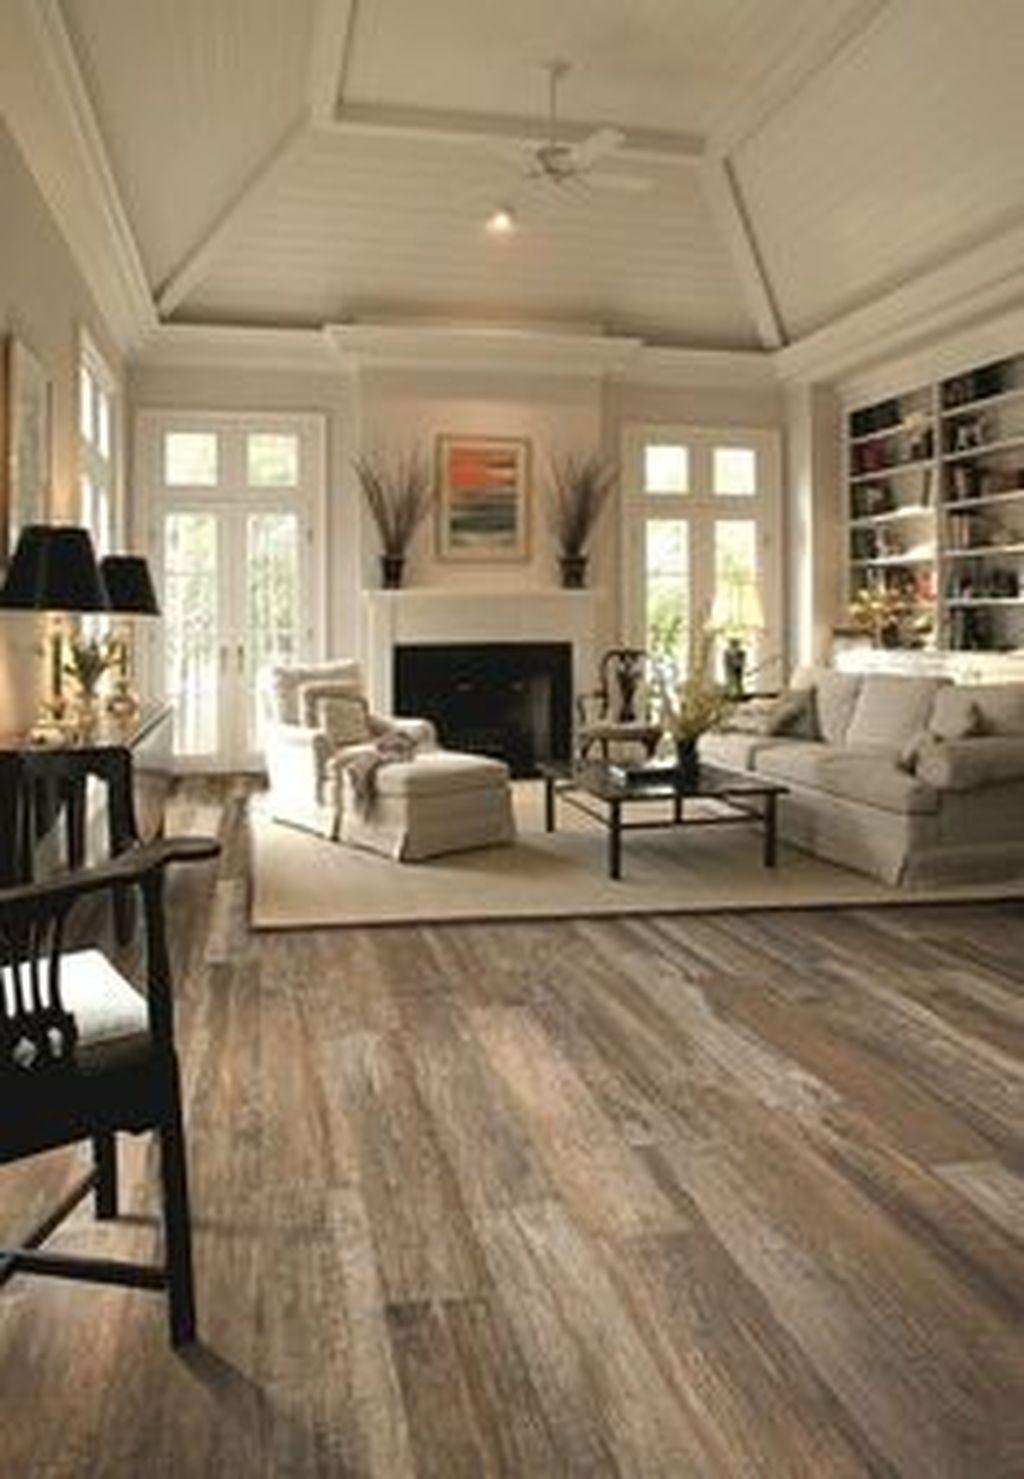 9 Modern Farmhouse Decoration Ideas For Living Room - Popy Home